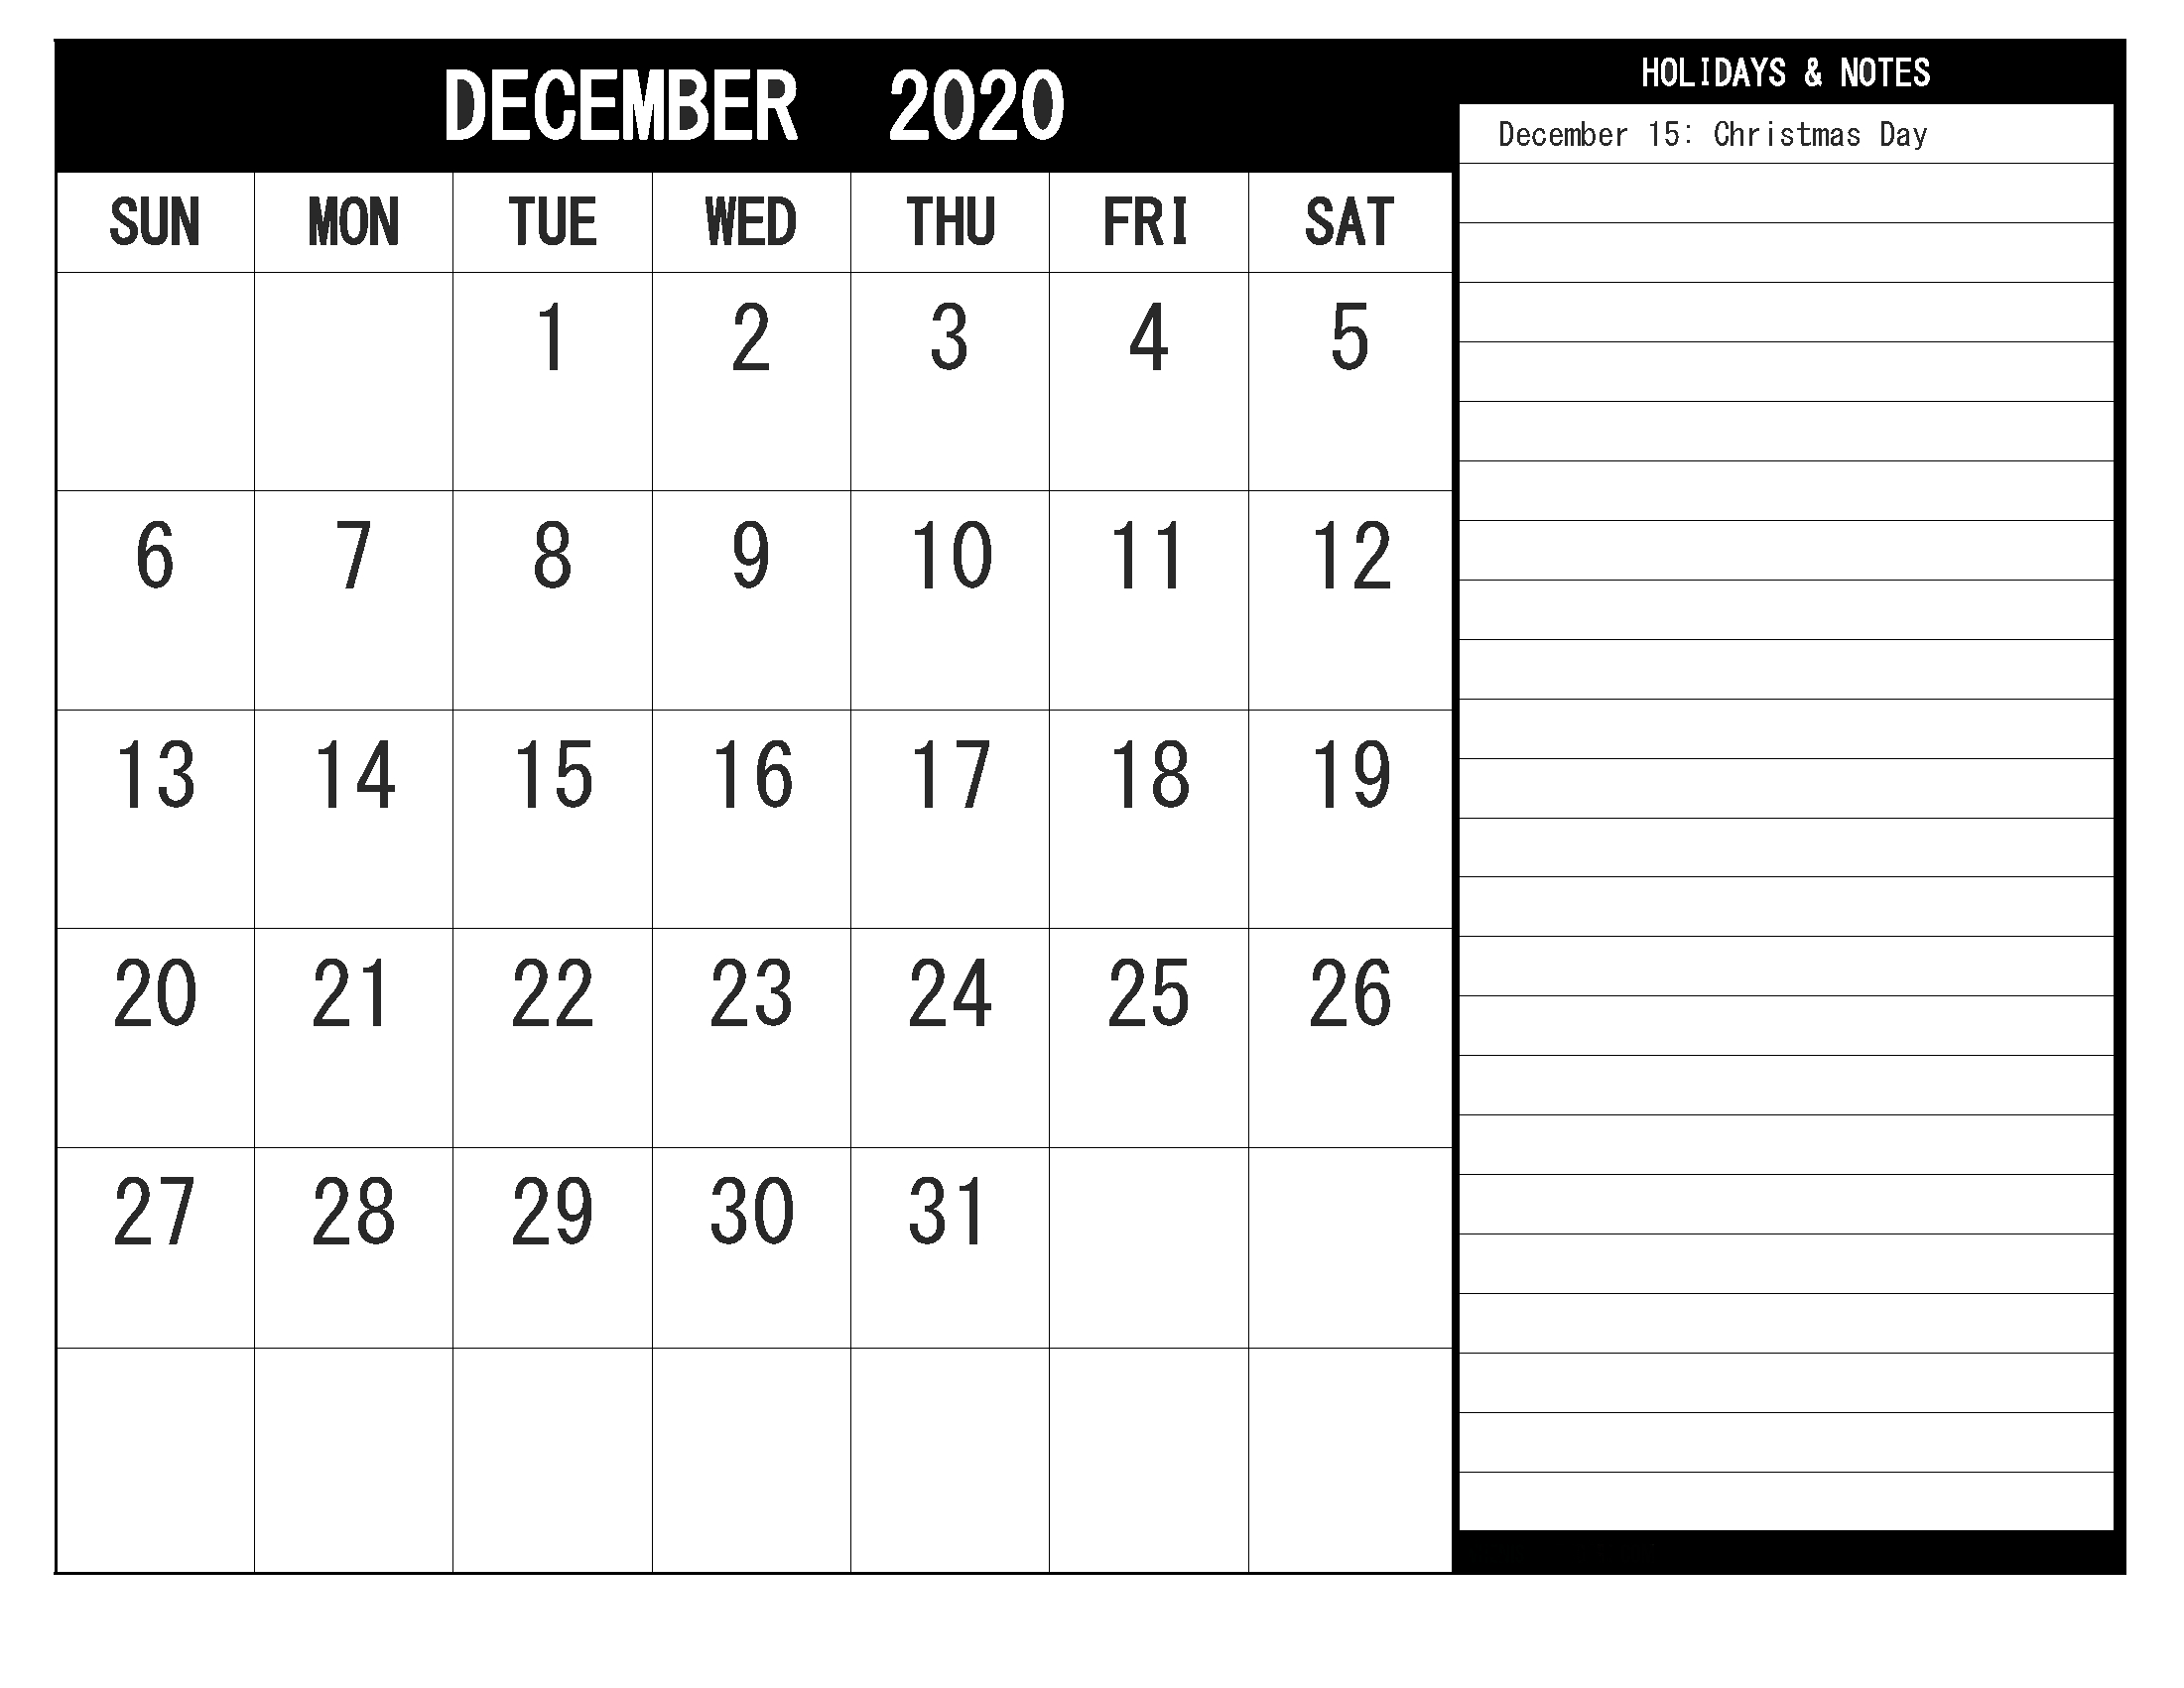 Free Blank December 2020 Calendar Printable In Pdf, Word pertaining to Max 30 Calendar Pdf